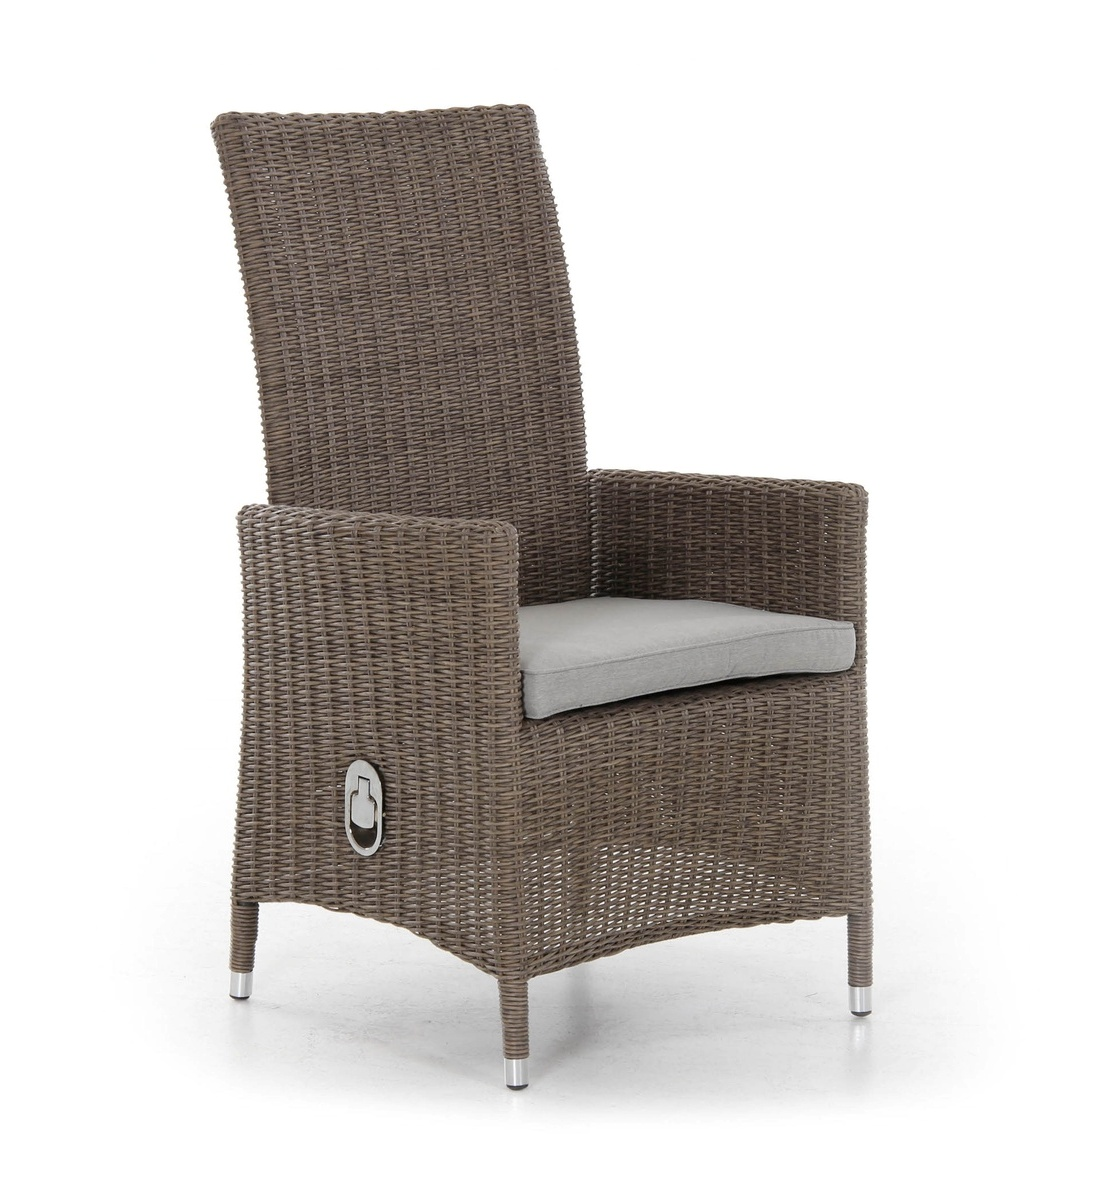 Плетеное кресло Ninja-3 Brafab